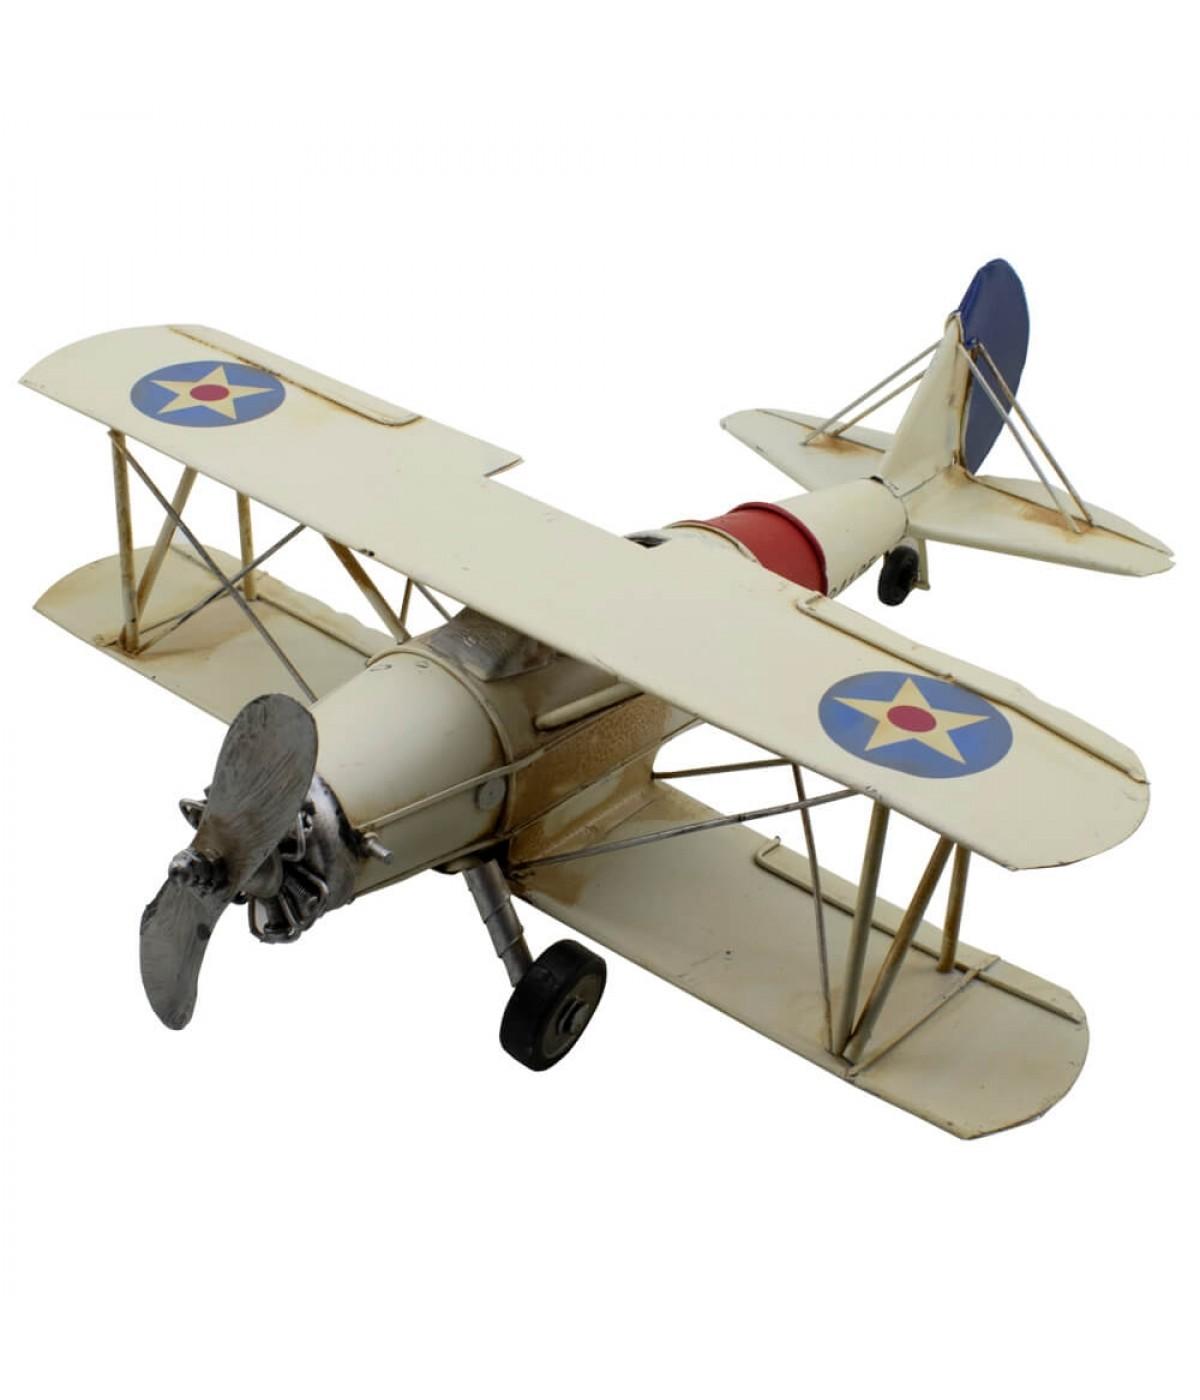 Avião Branco 1 Hélice Asa Dupla 34cm Estilo Retrô - Vintage